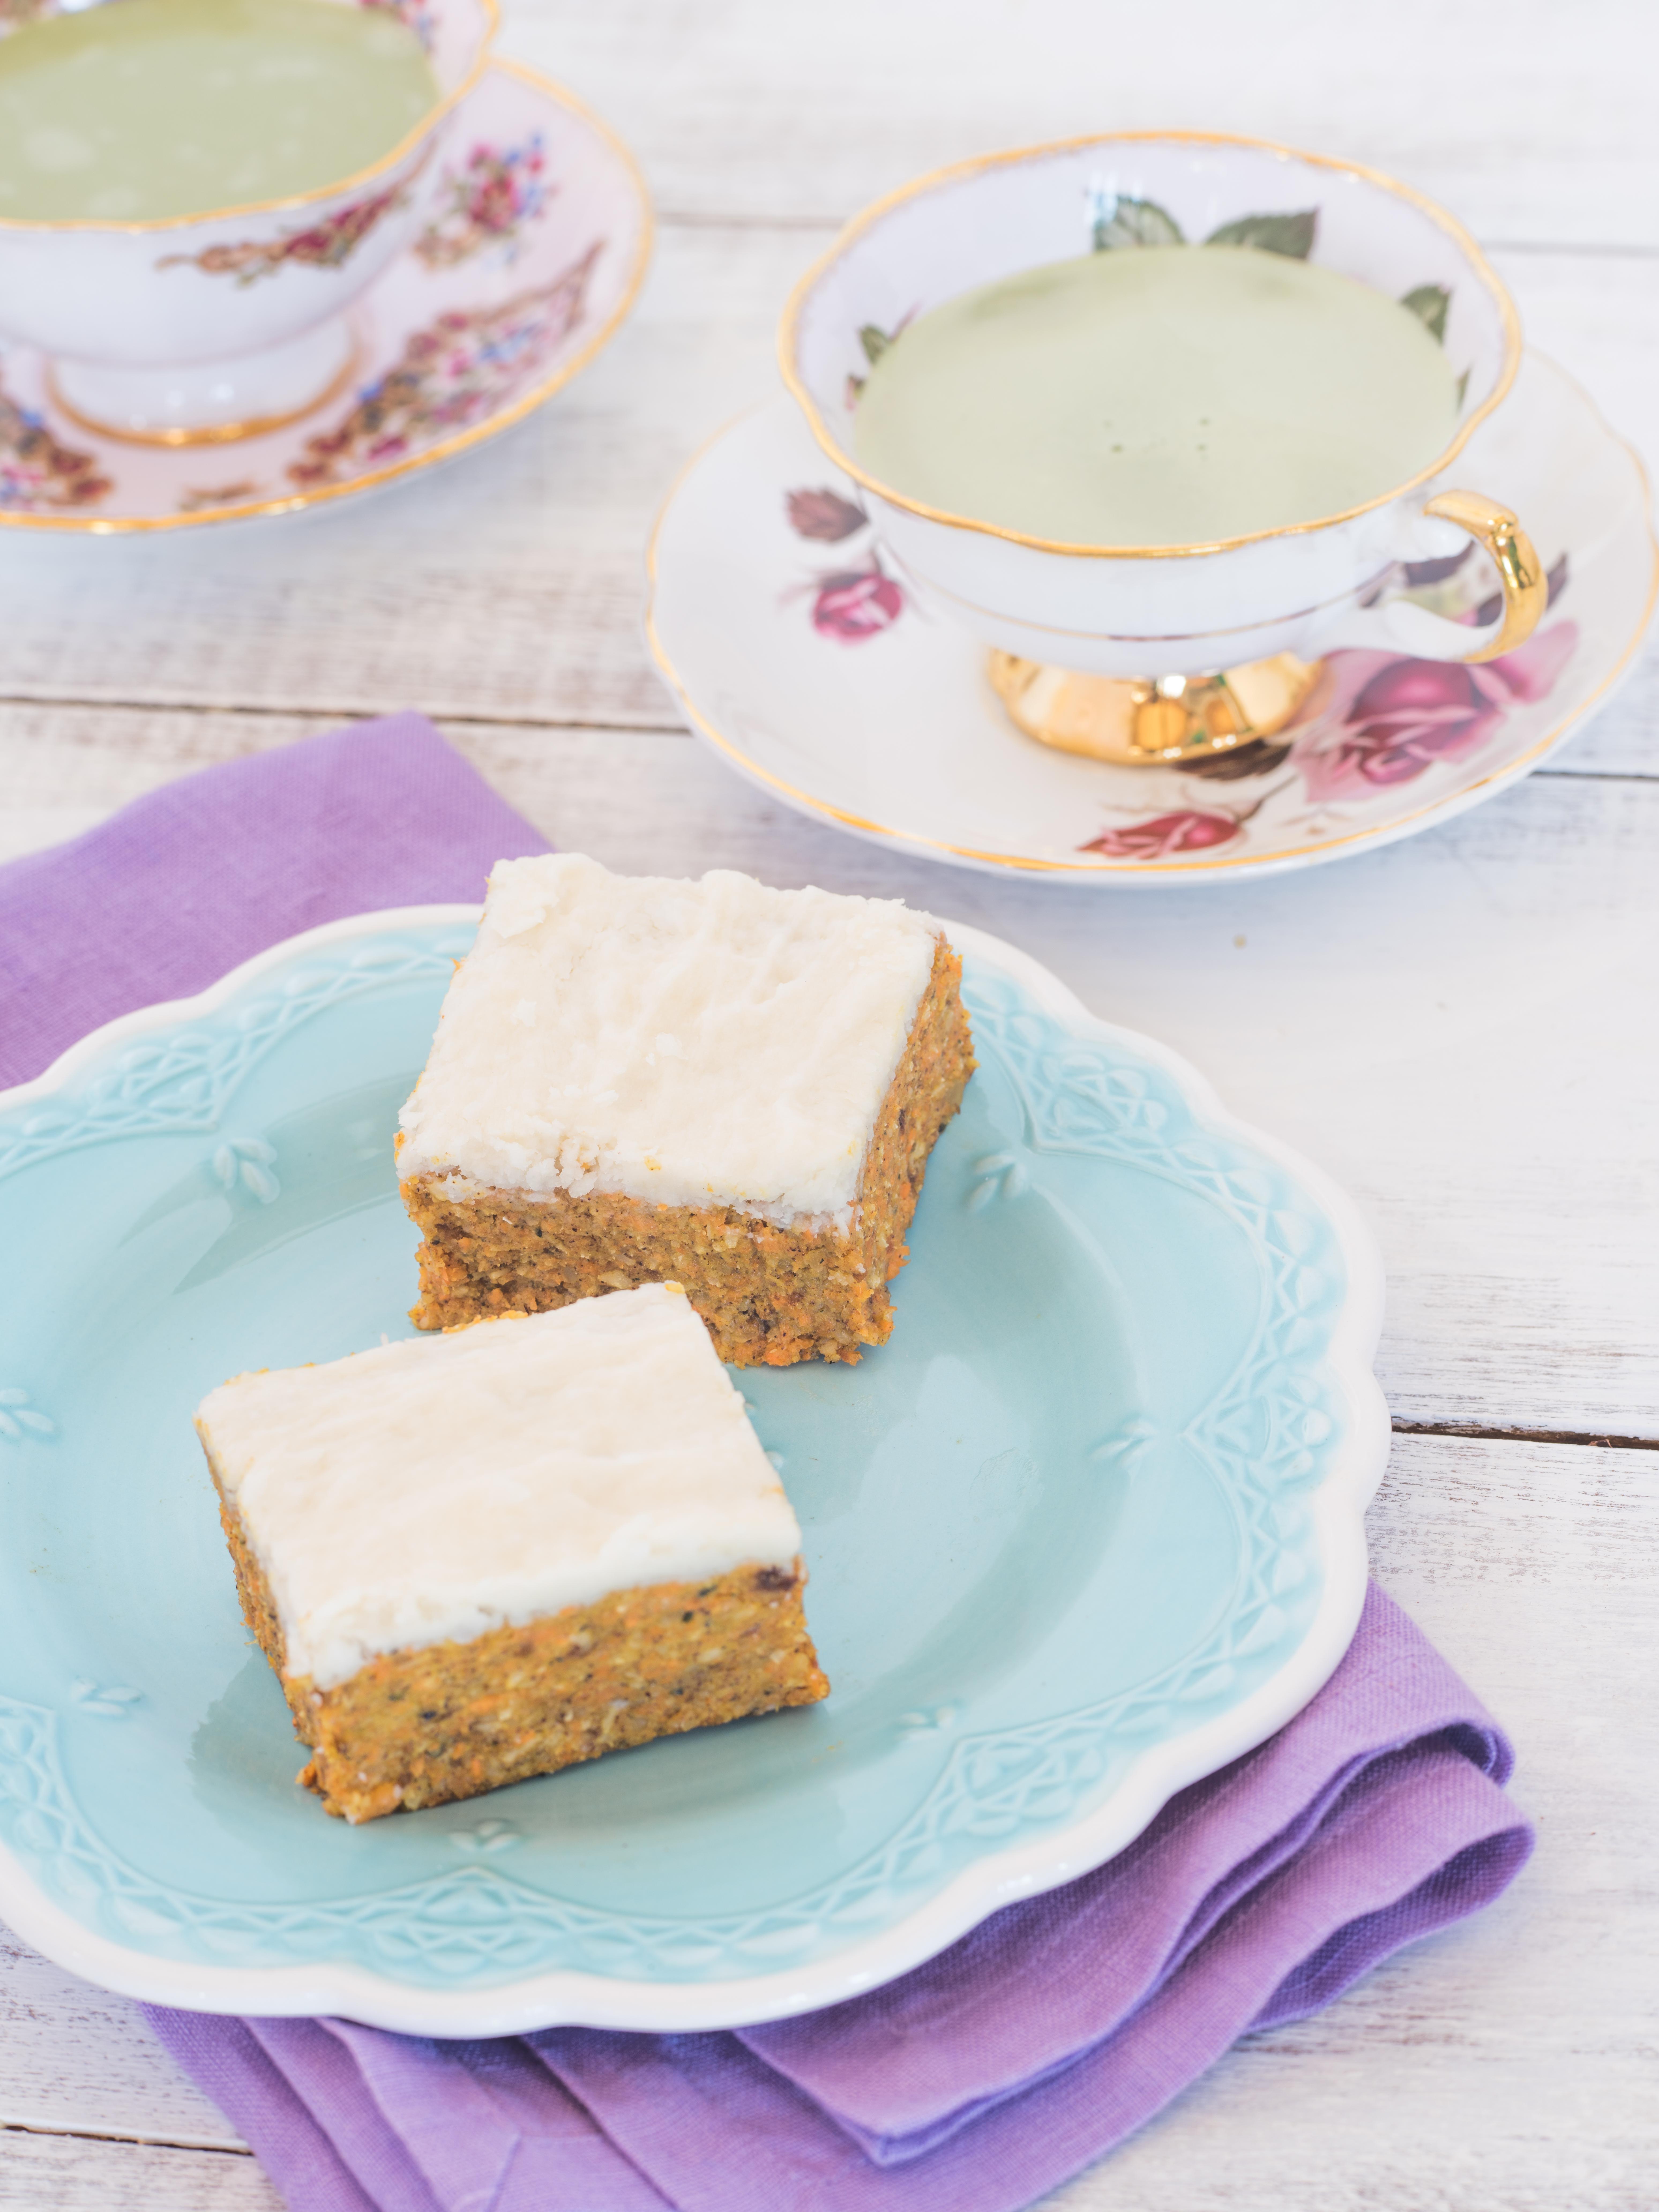 No-Bake Carrot Cake Squares with Lemon Icing